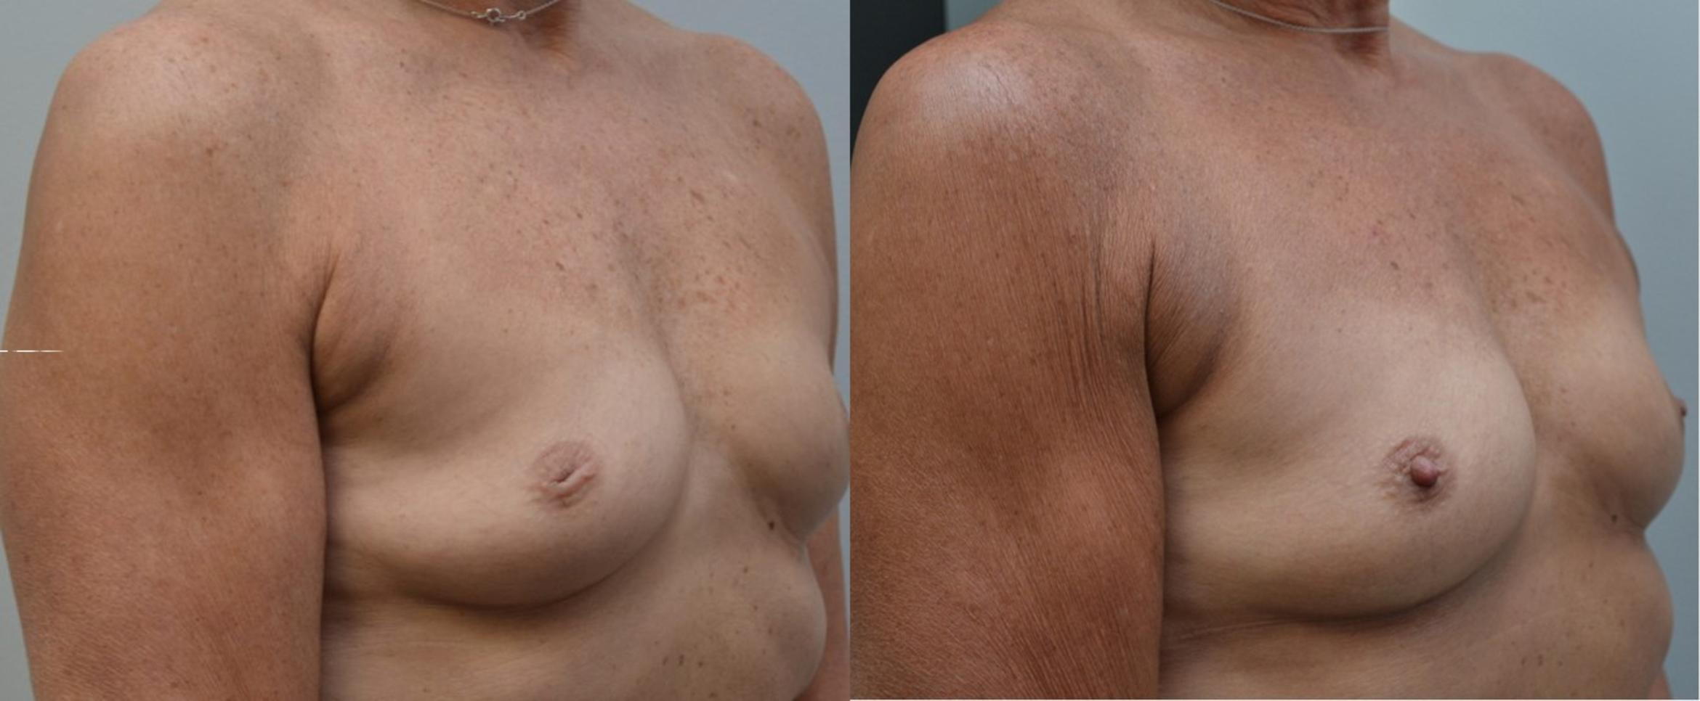 Inverted Nipple Images